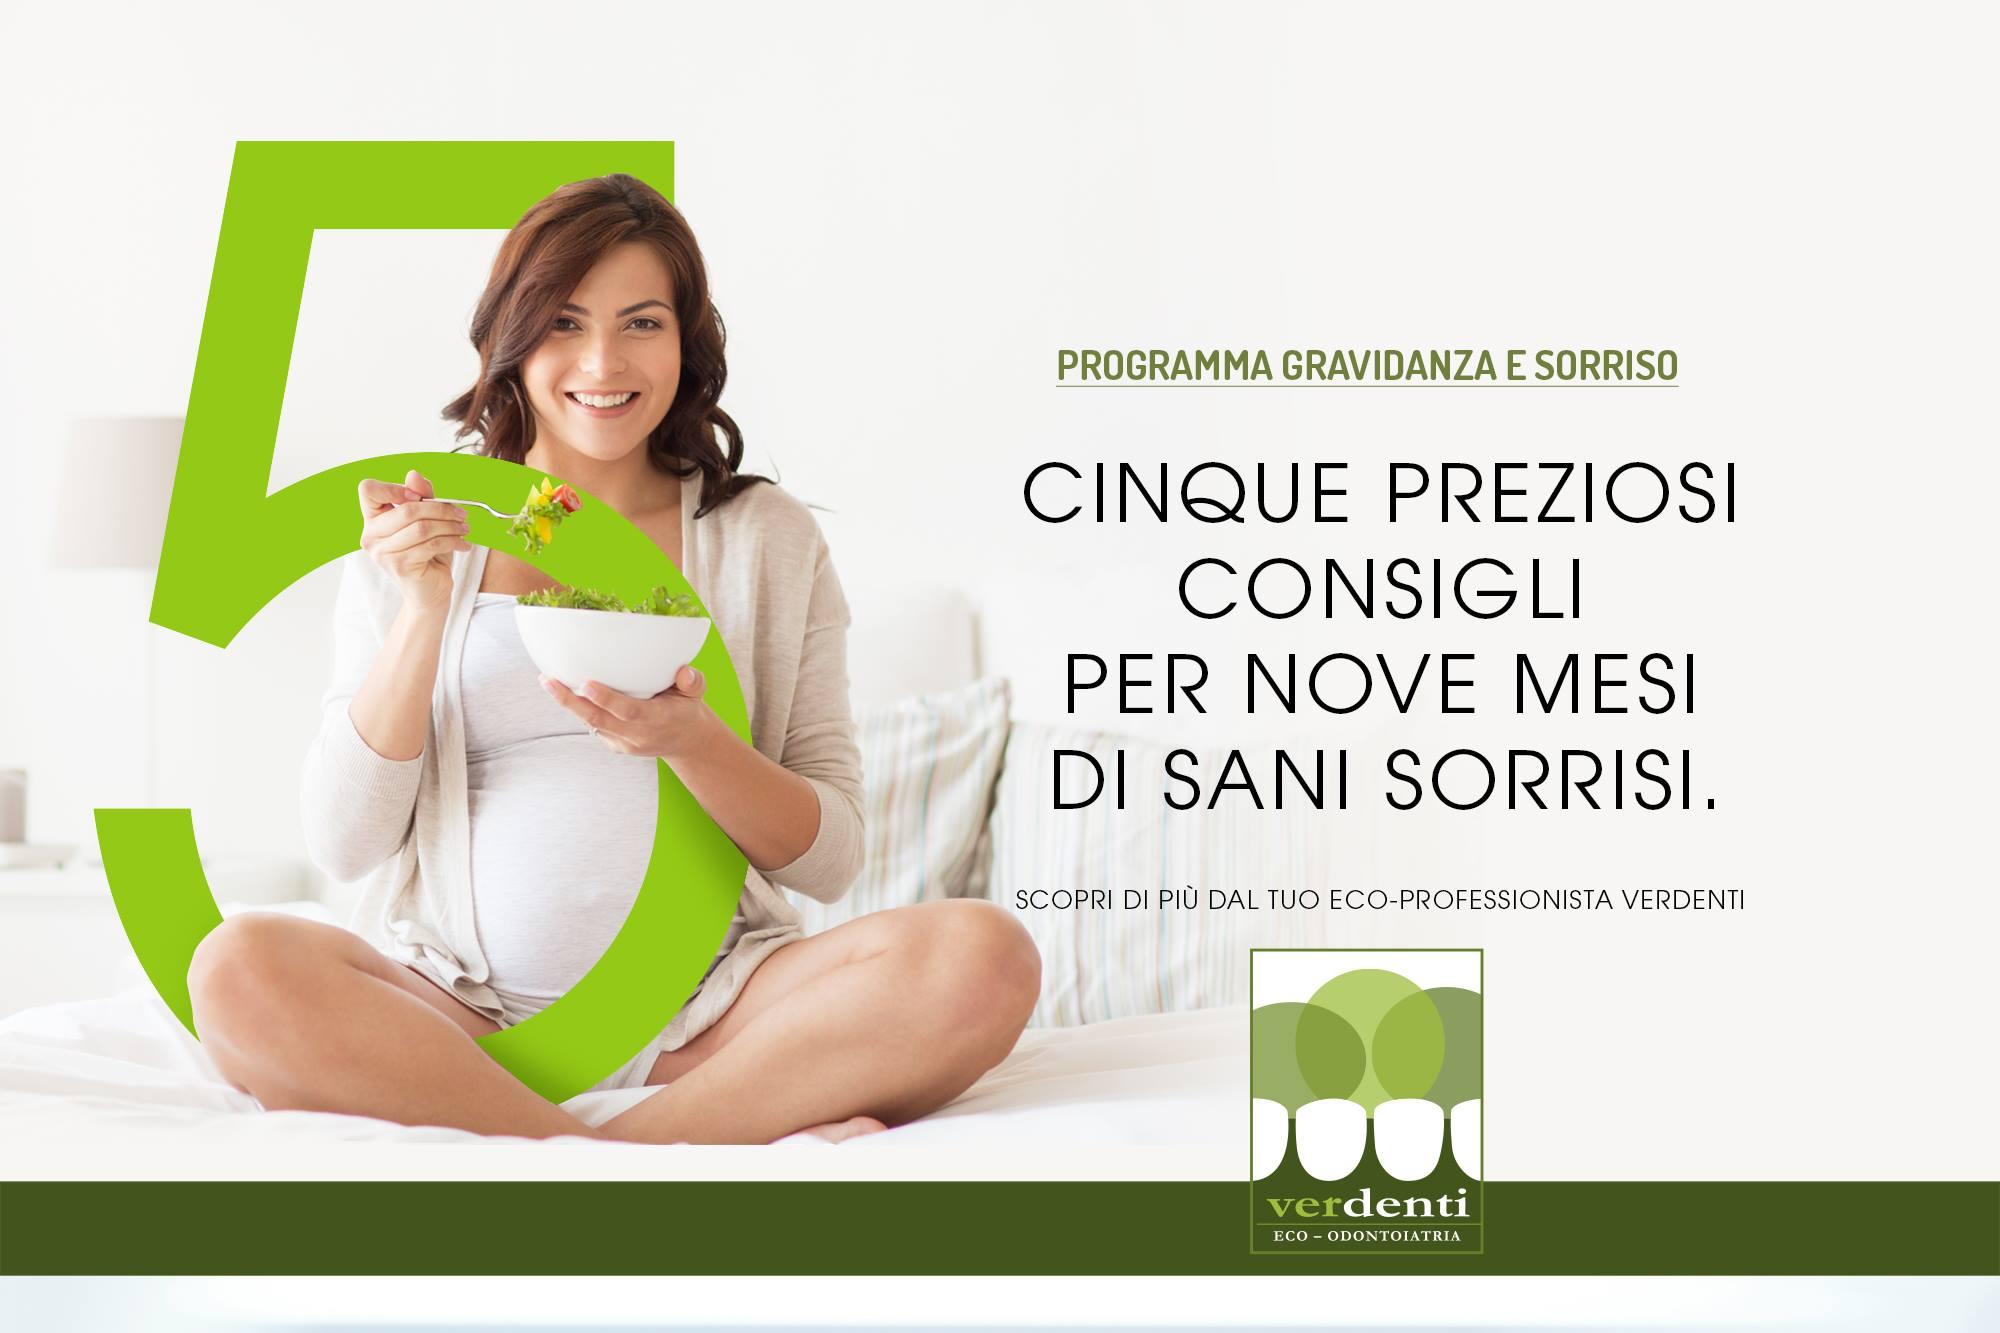 Problemi gengive in gravidanza